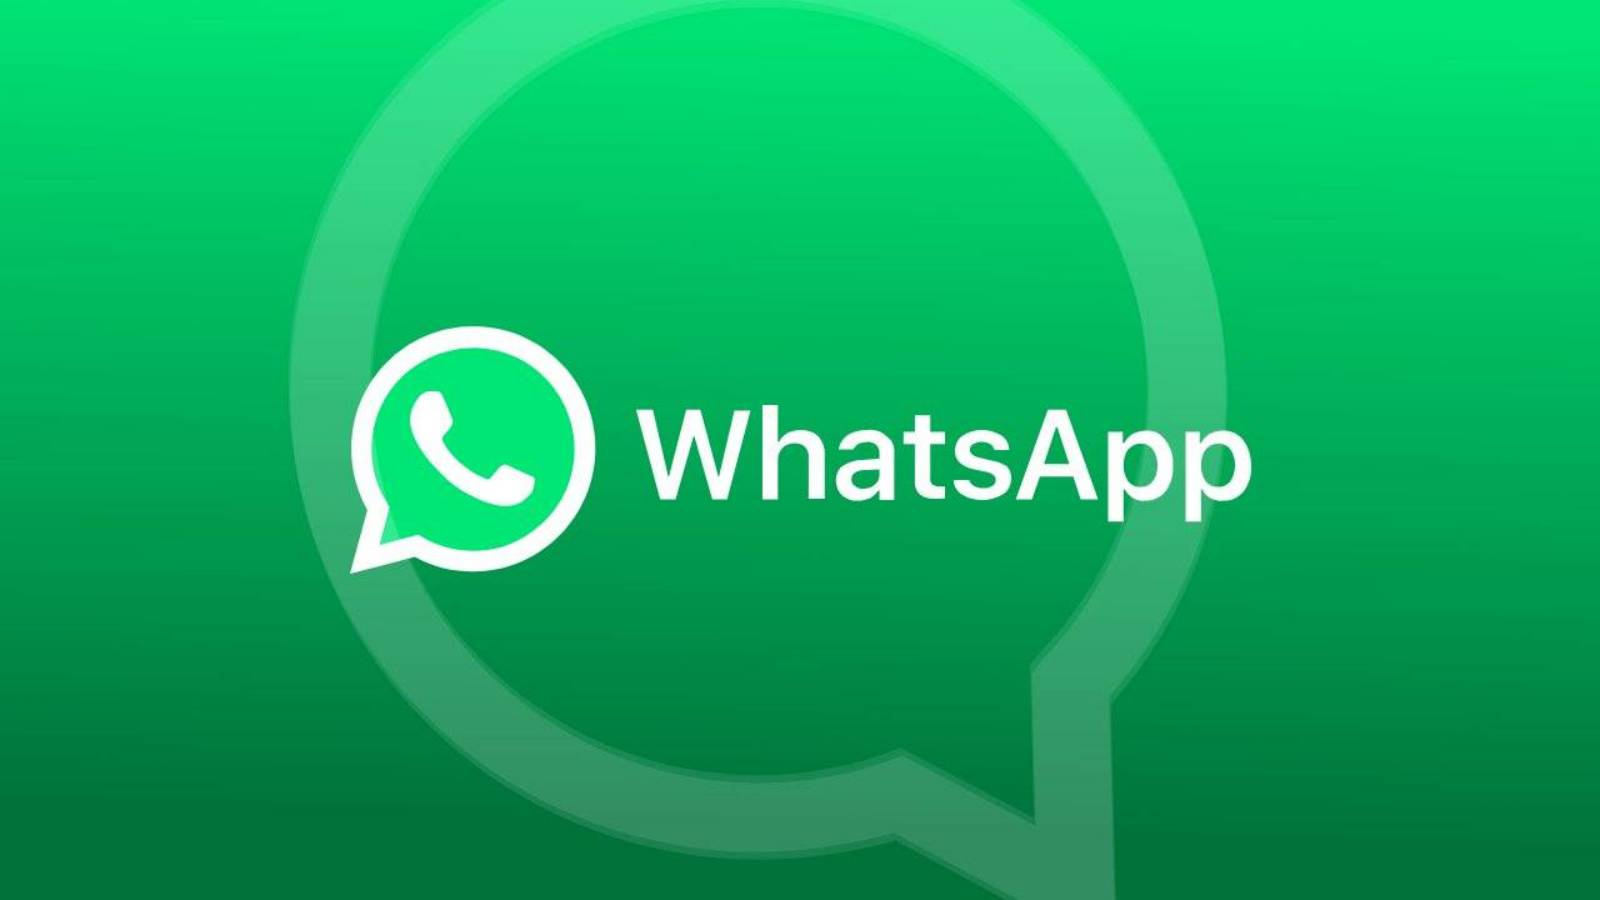 WhatsApp verde